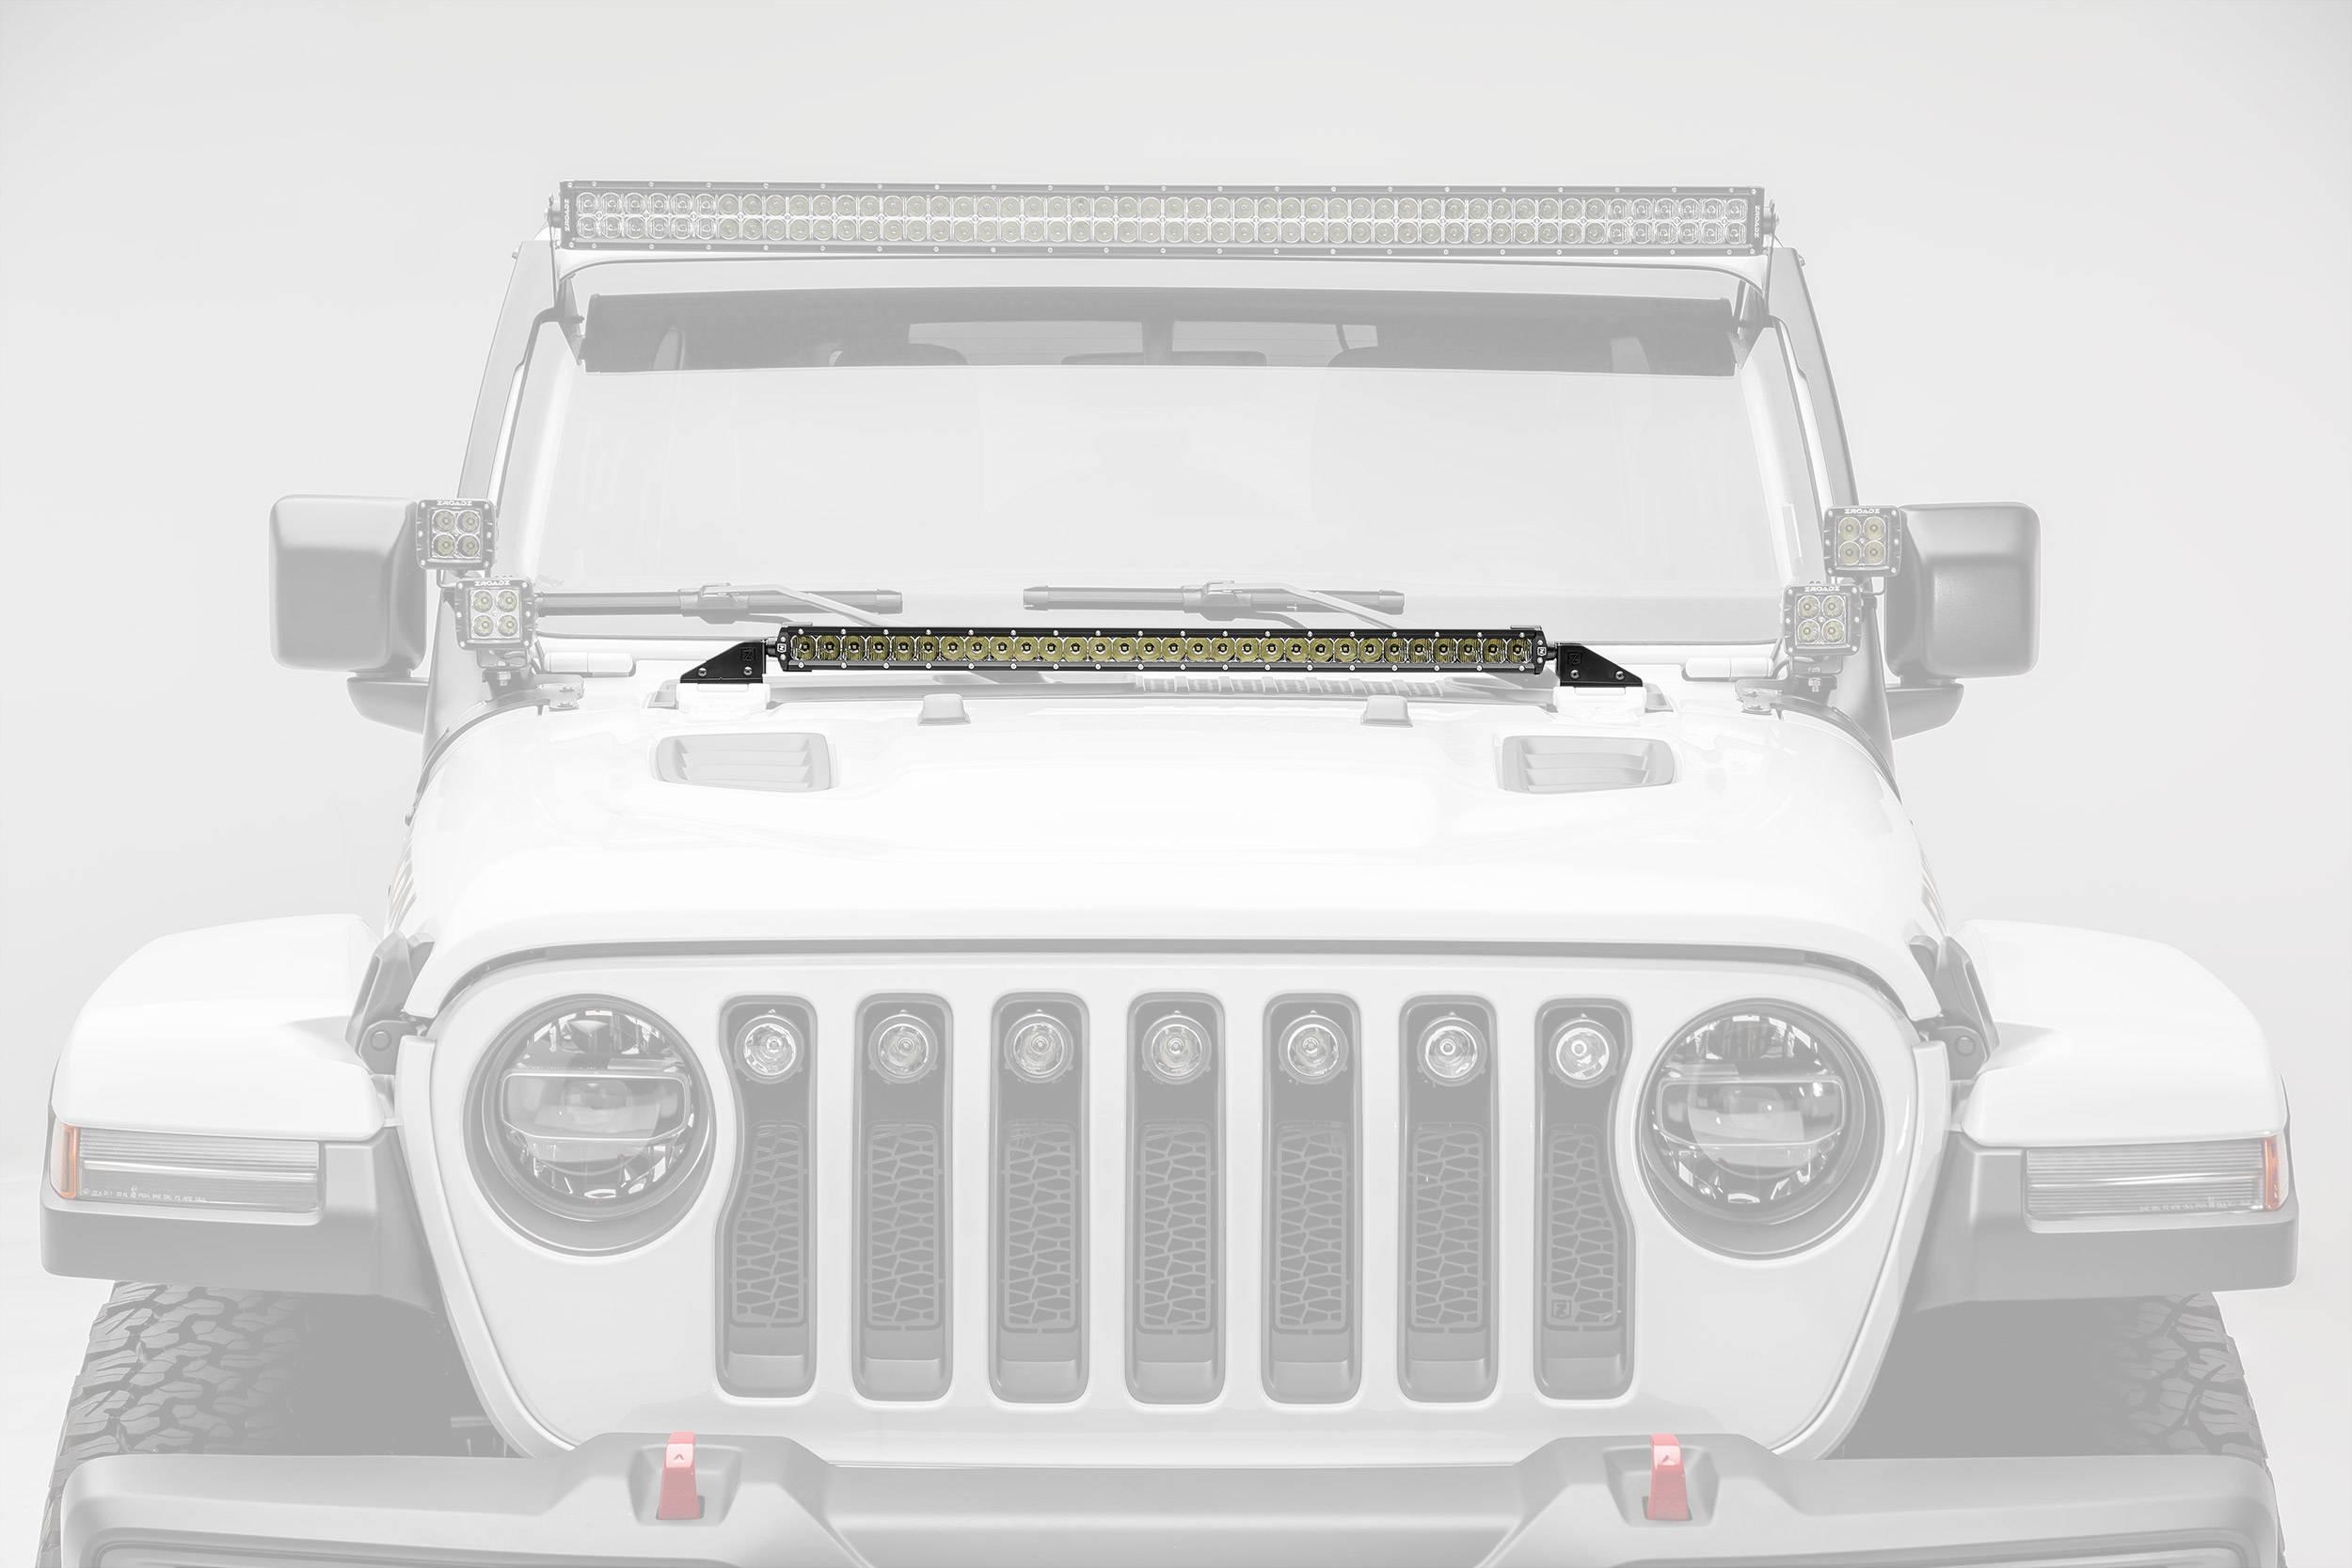 Jeep JL, Gladiator Hood Cowl LED Kit, Incl. 30 Inch LED Straight Single Row Slim Light Bar - PN #Z36